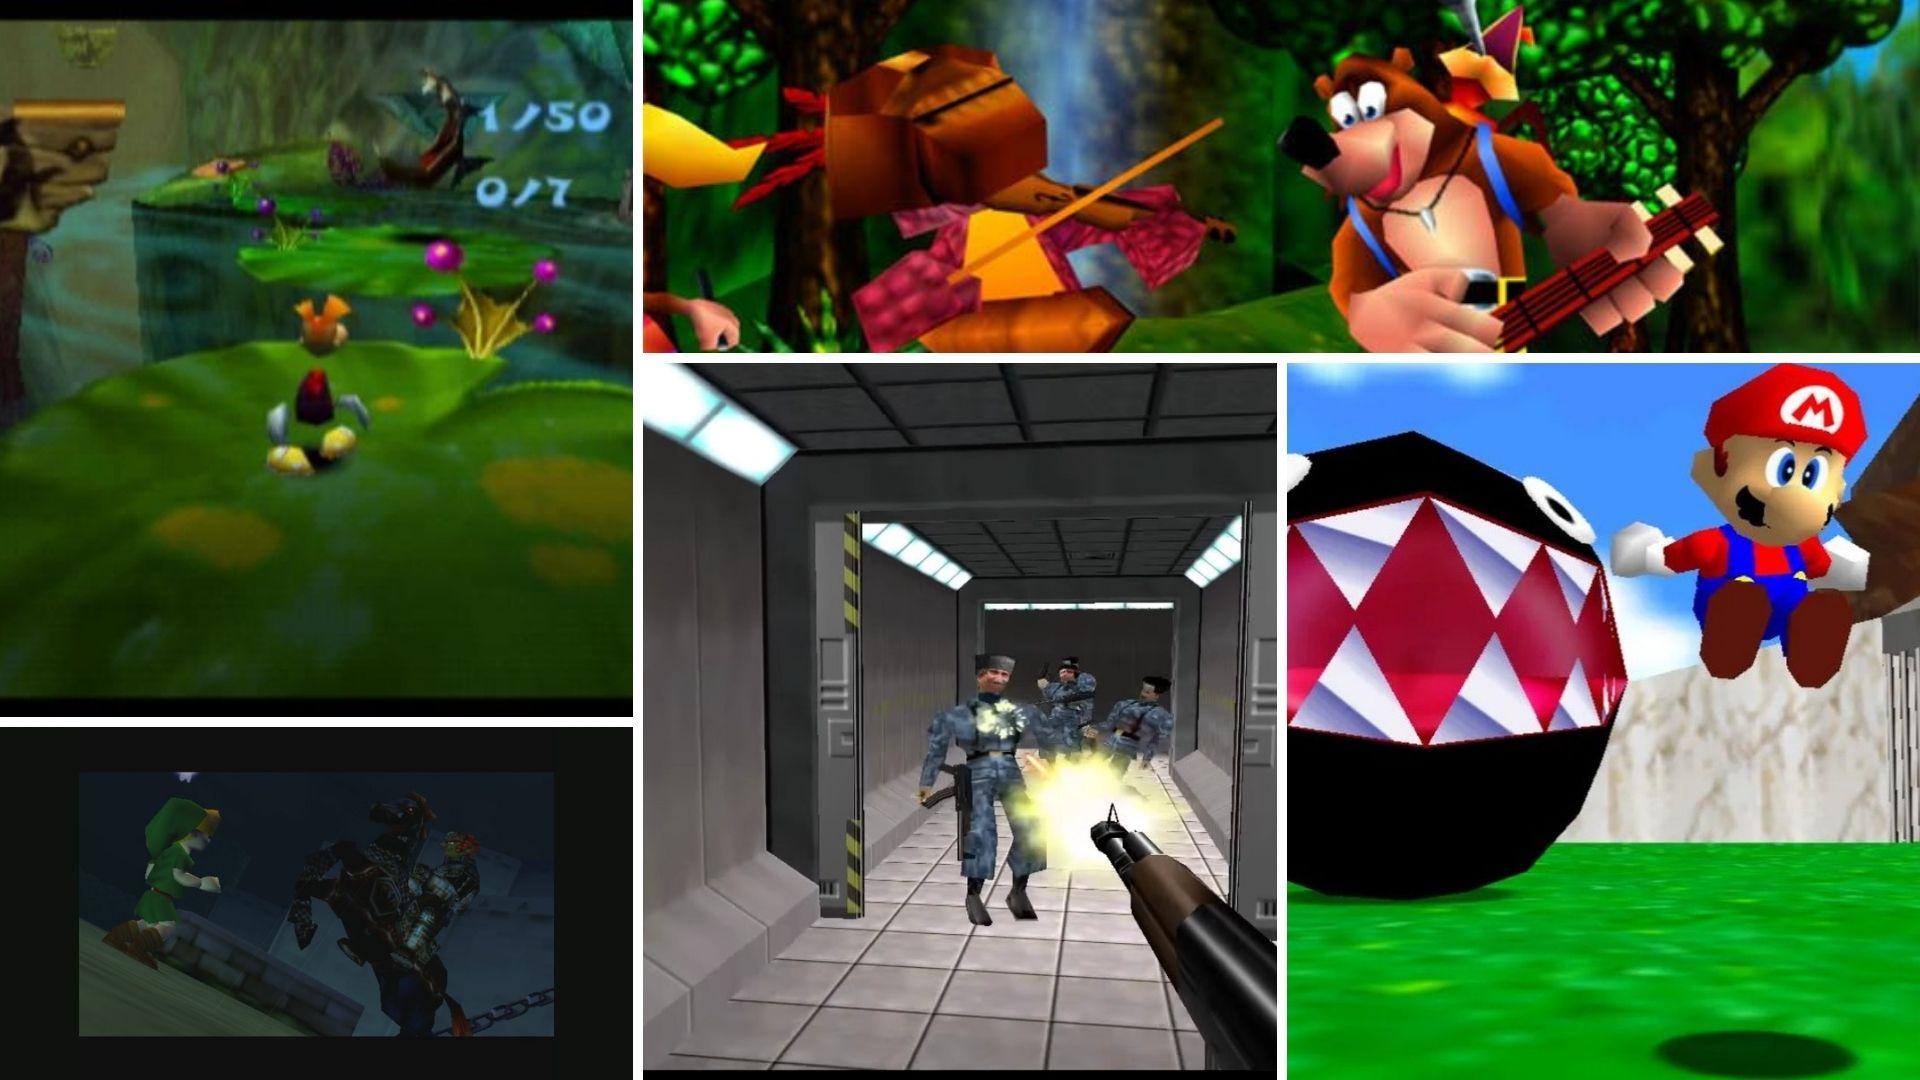 Nintendo 64 eri pelejä